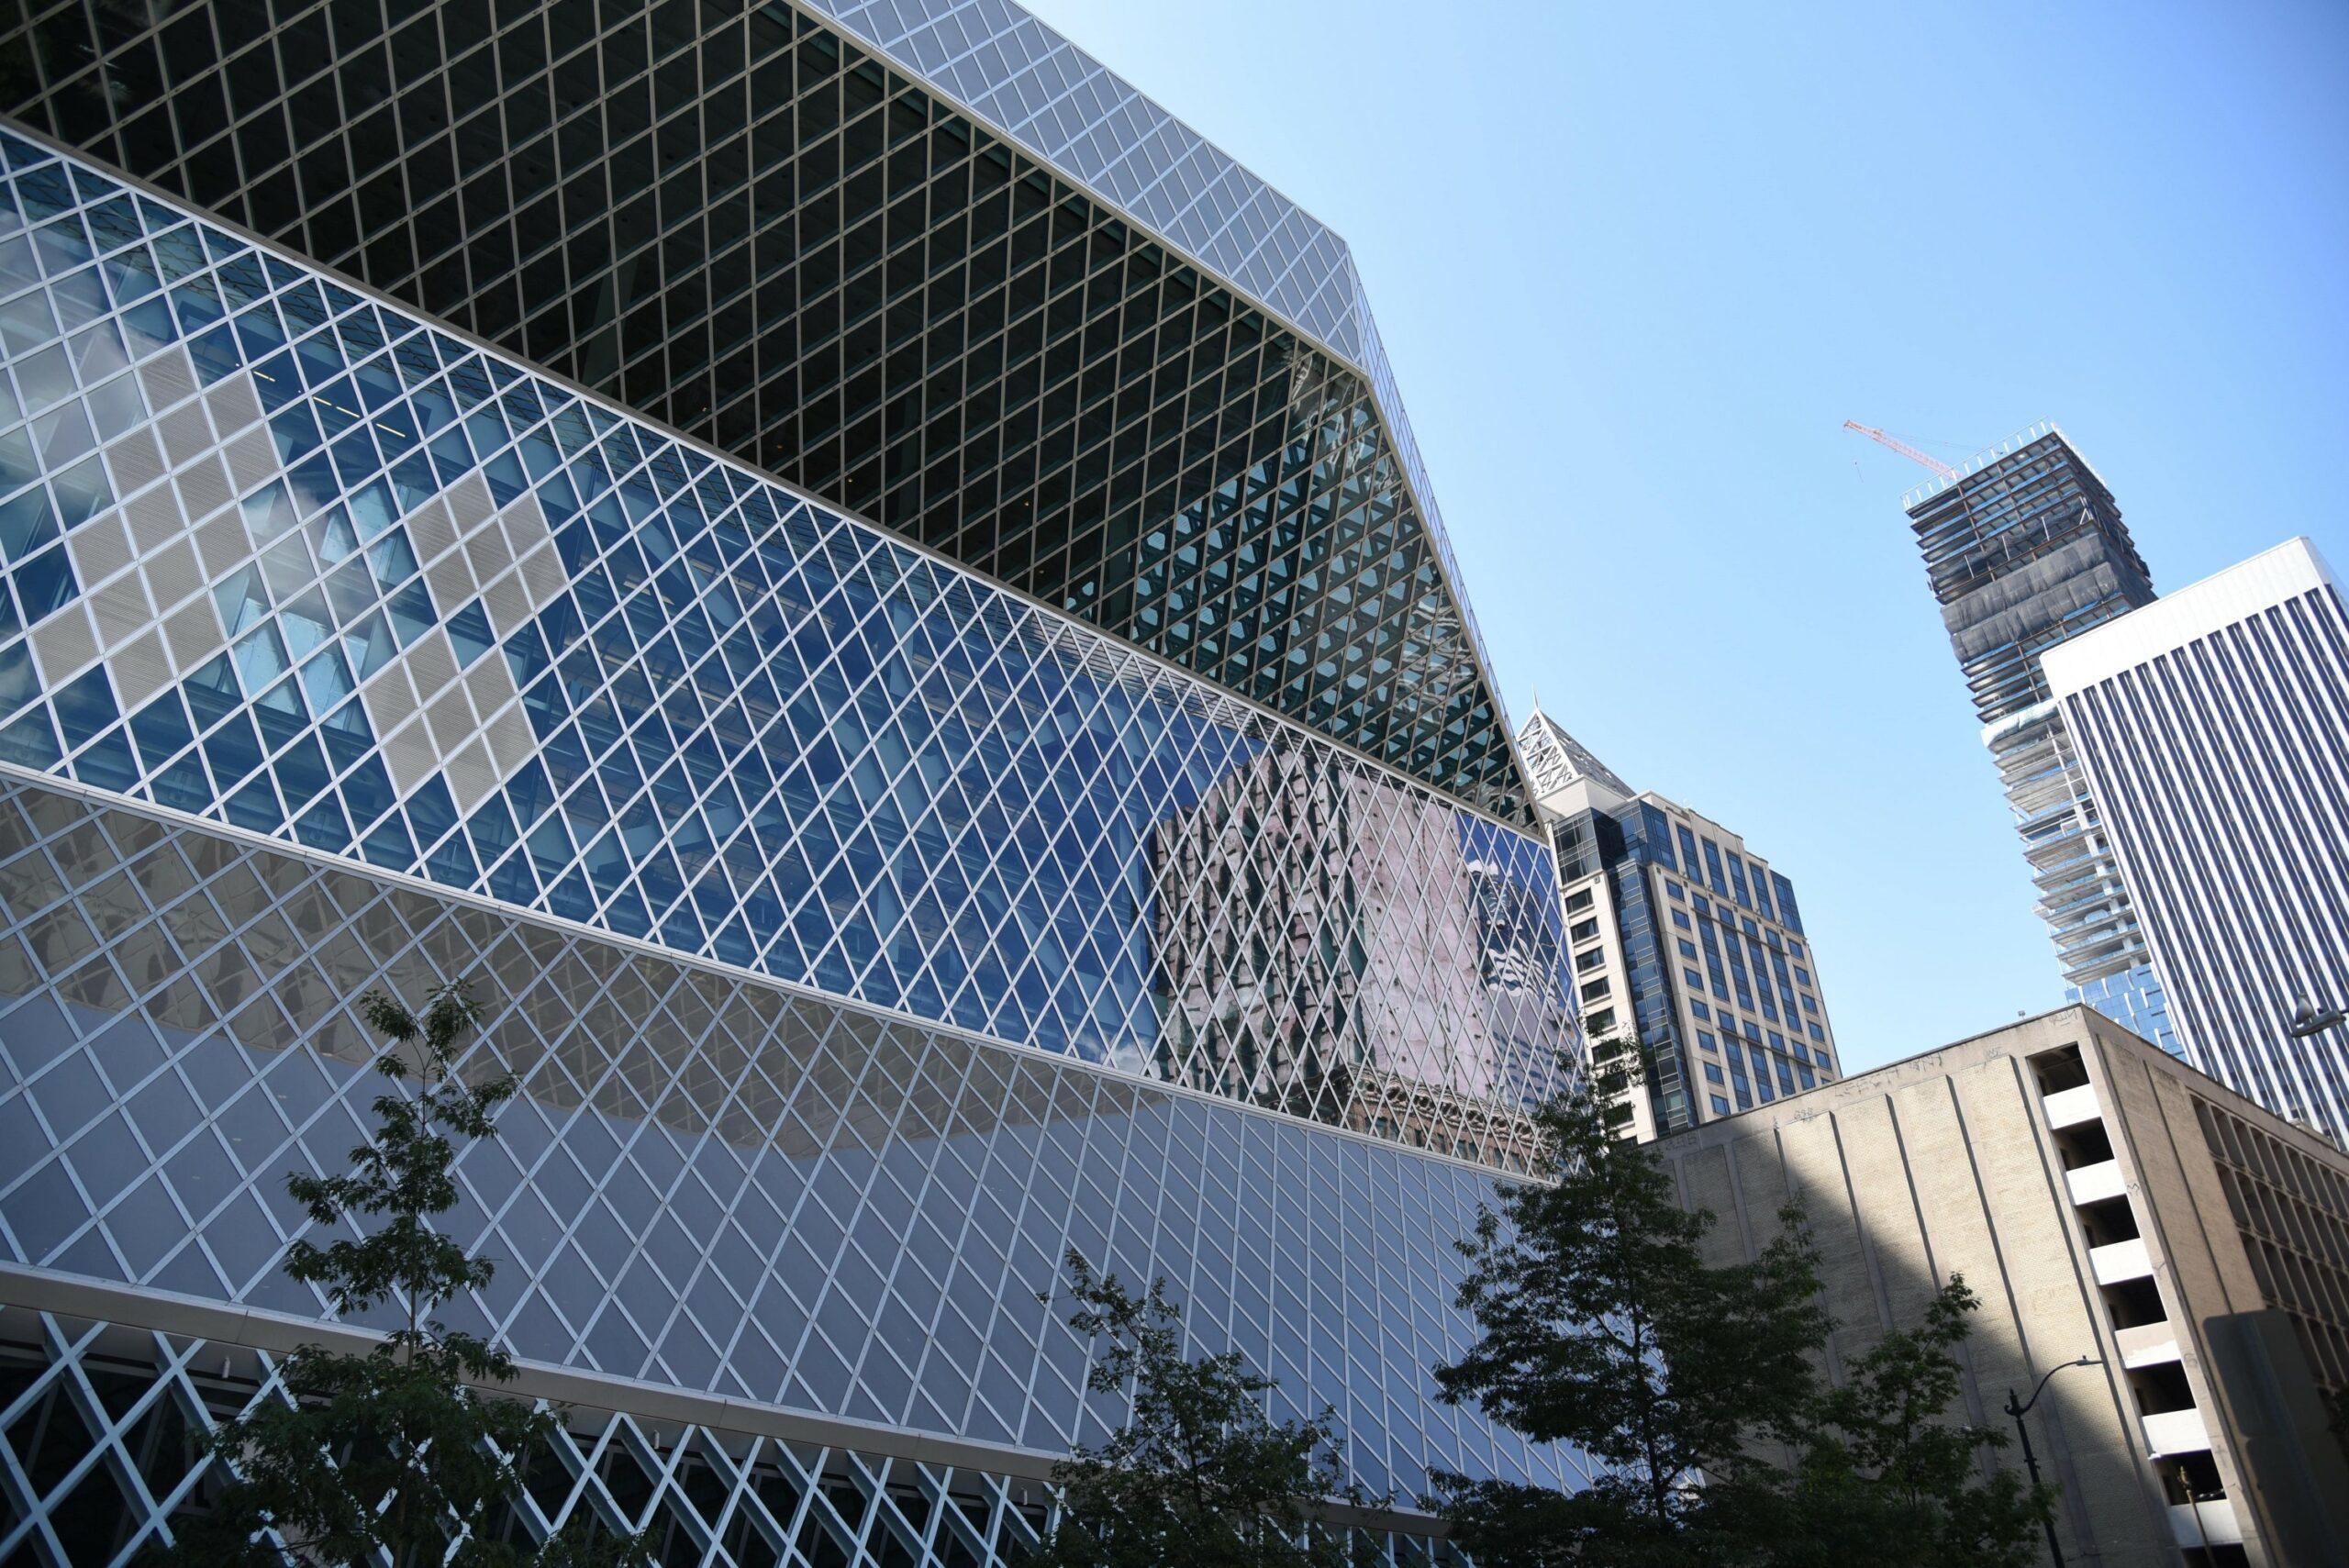 la façade de la bibliothèque de Seattle